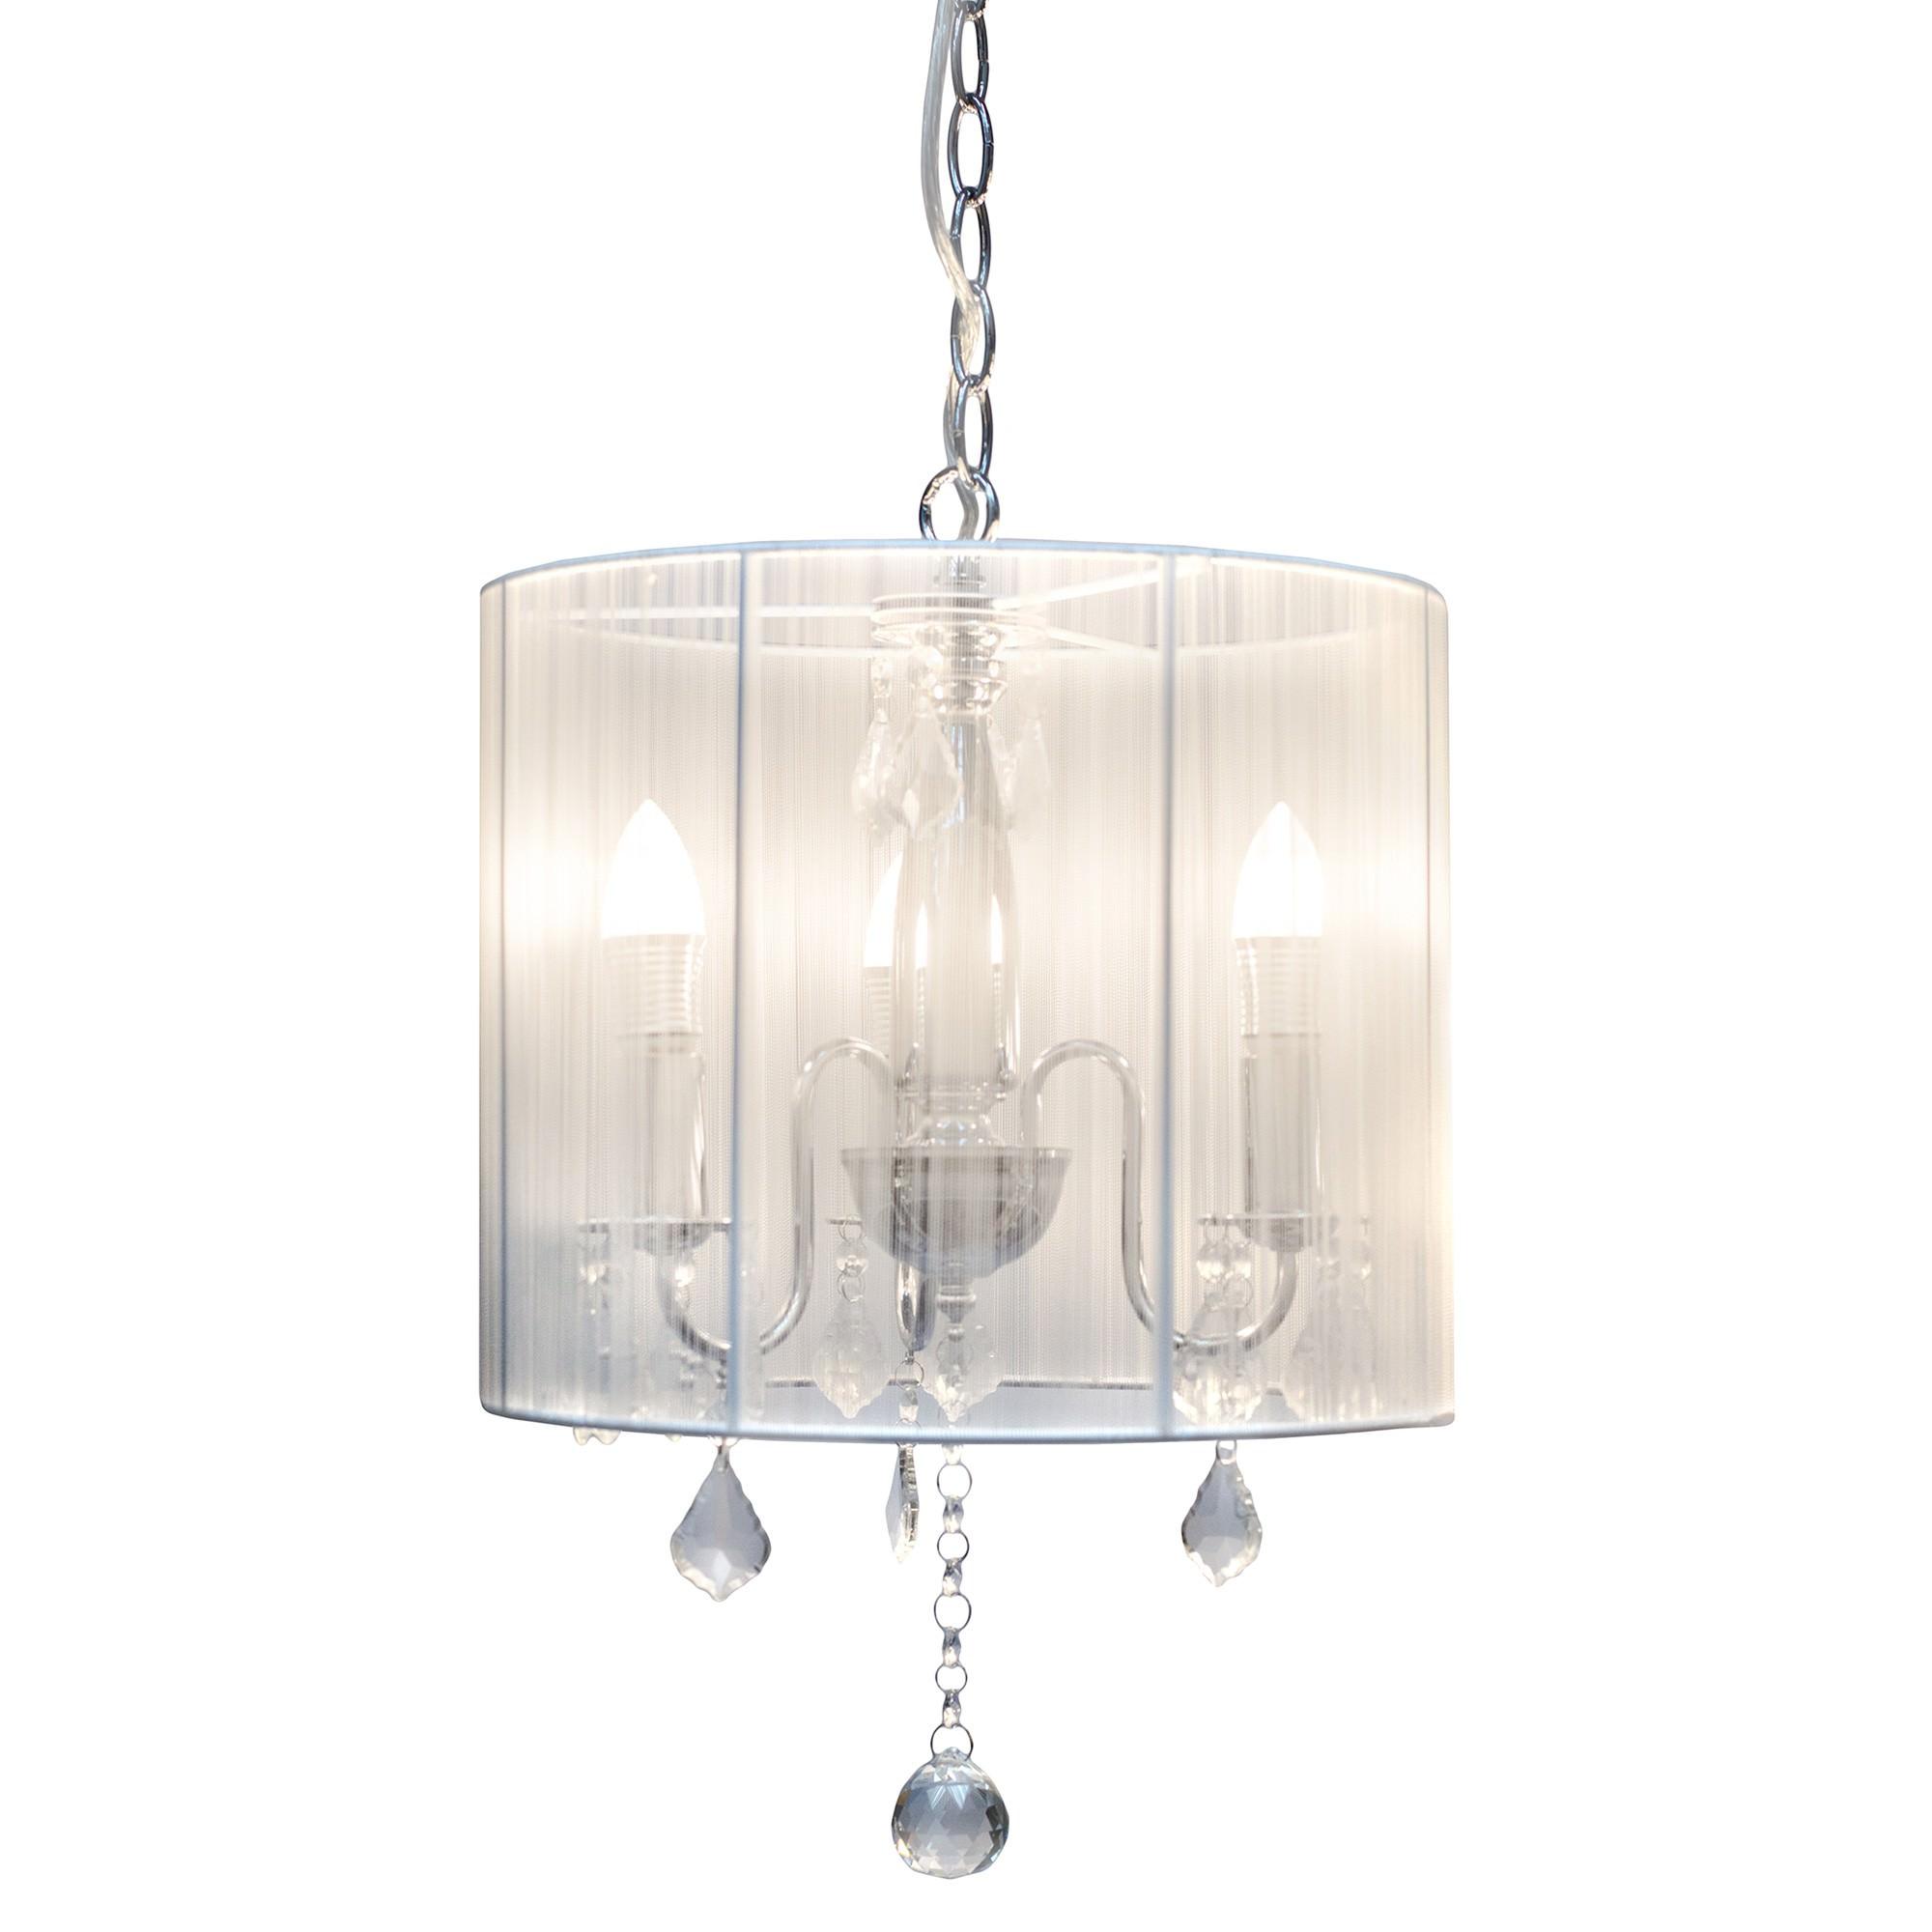 Paris Crystal Pendant Light, 3 Light, White